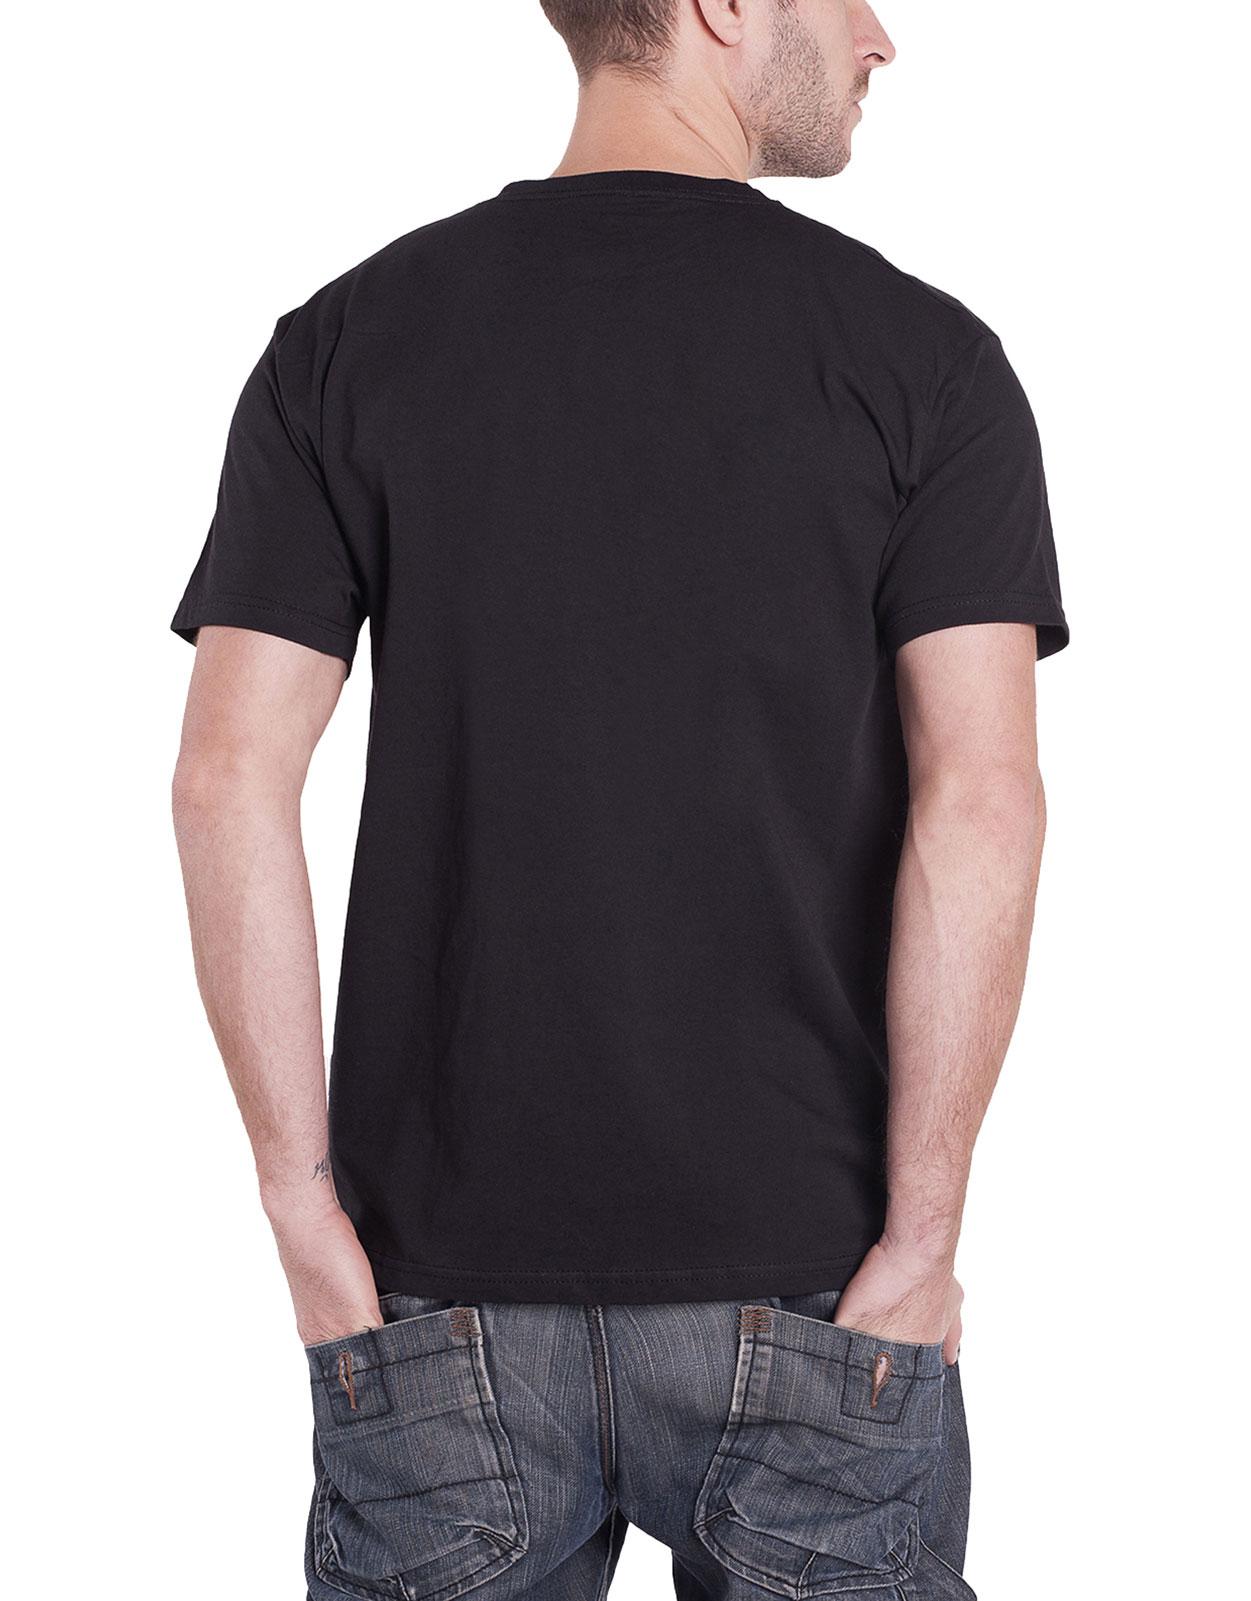 Camiseta-Last-Jedi-De-Star-Wars-Movie-Poster-porgs-Guardia-pretoriana-oficial-para-hombre miniatura 25